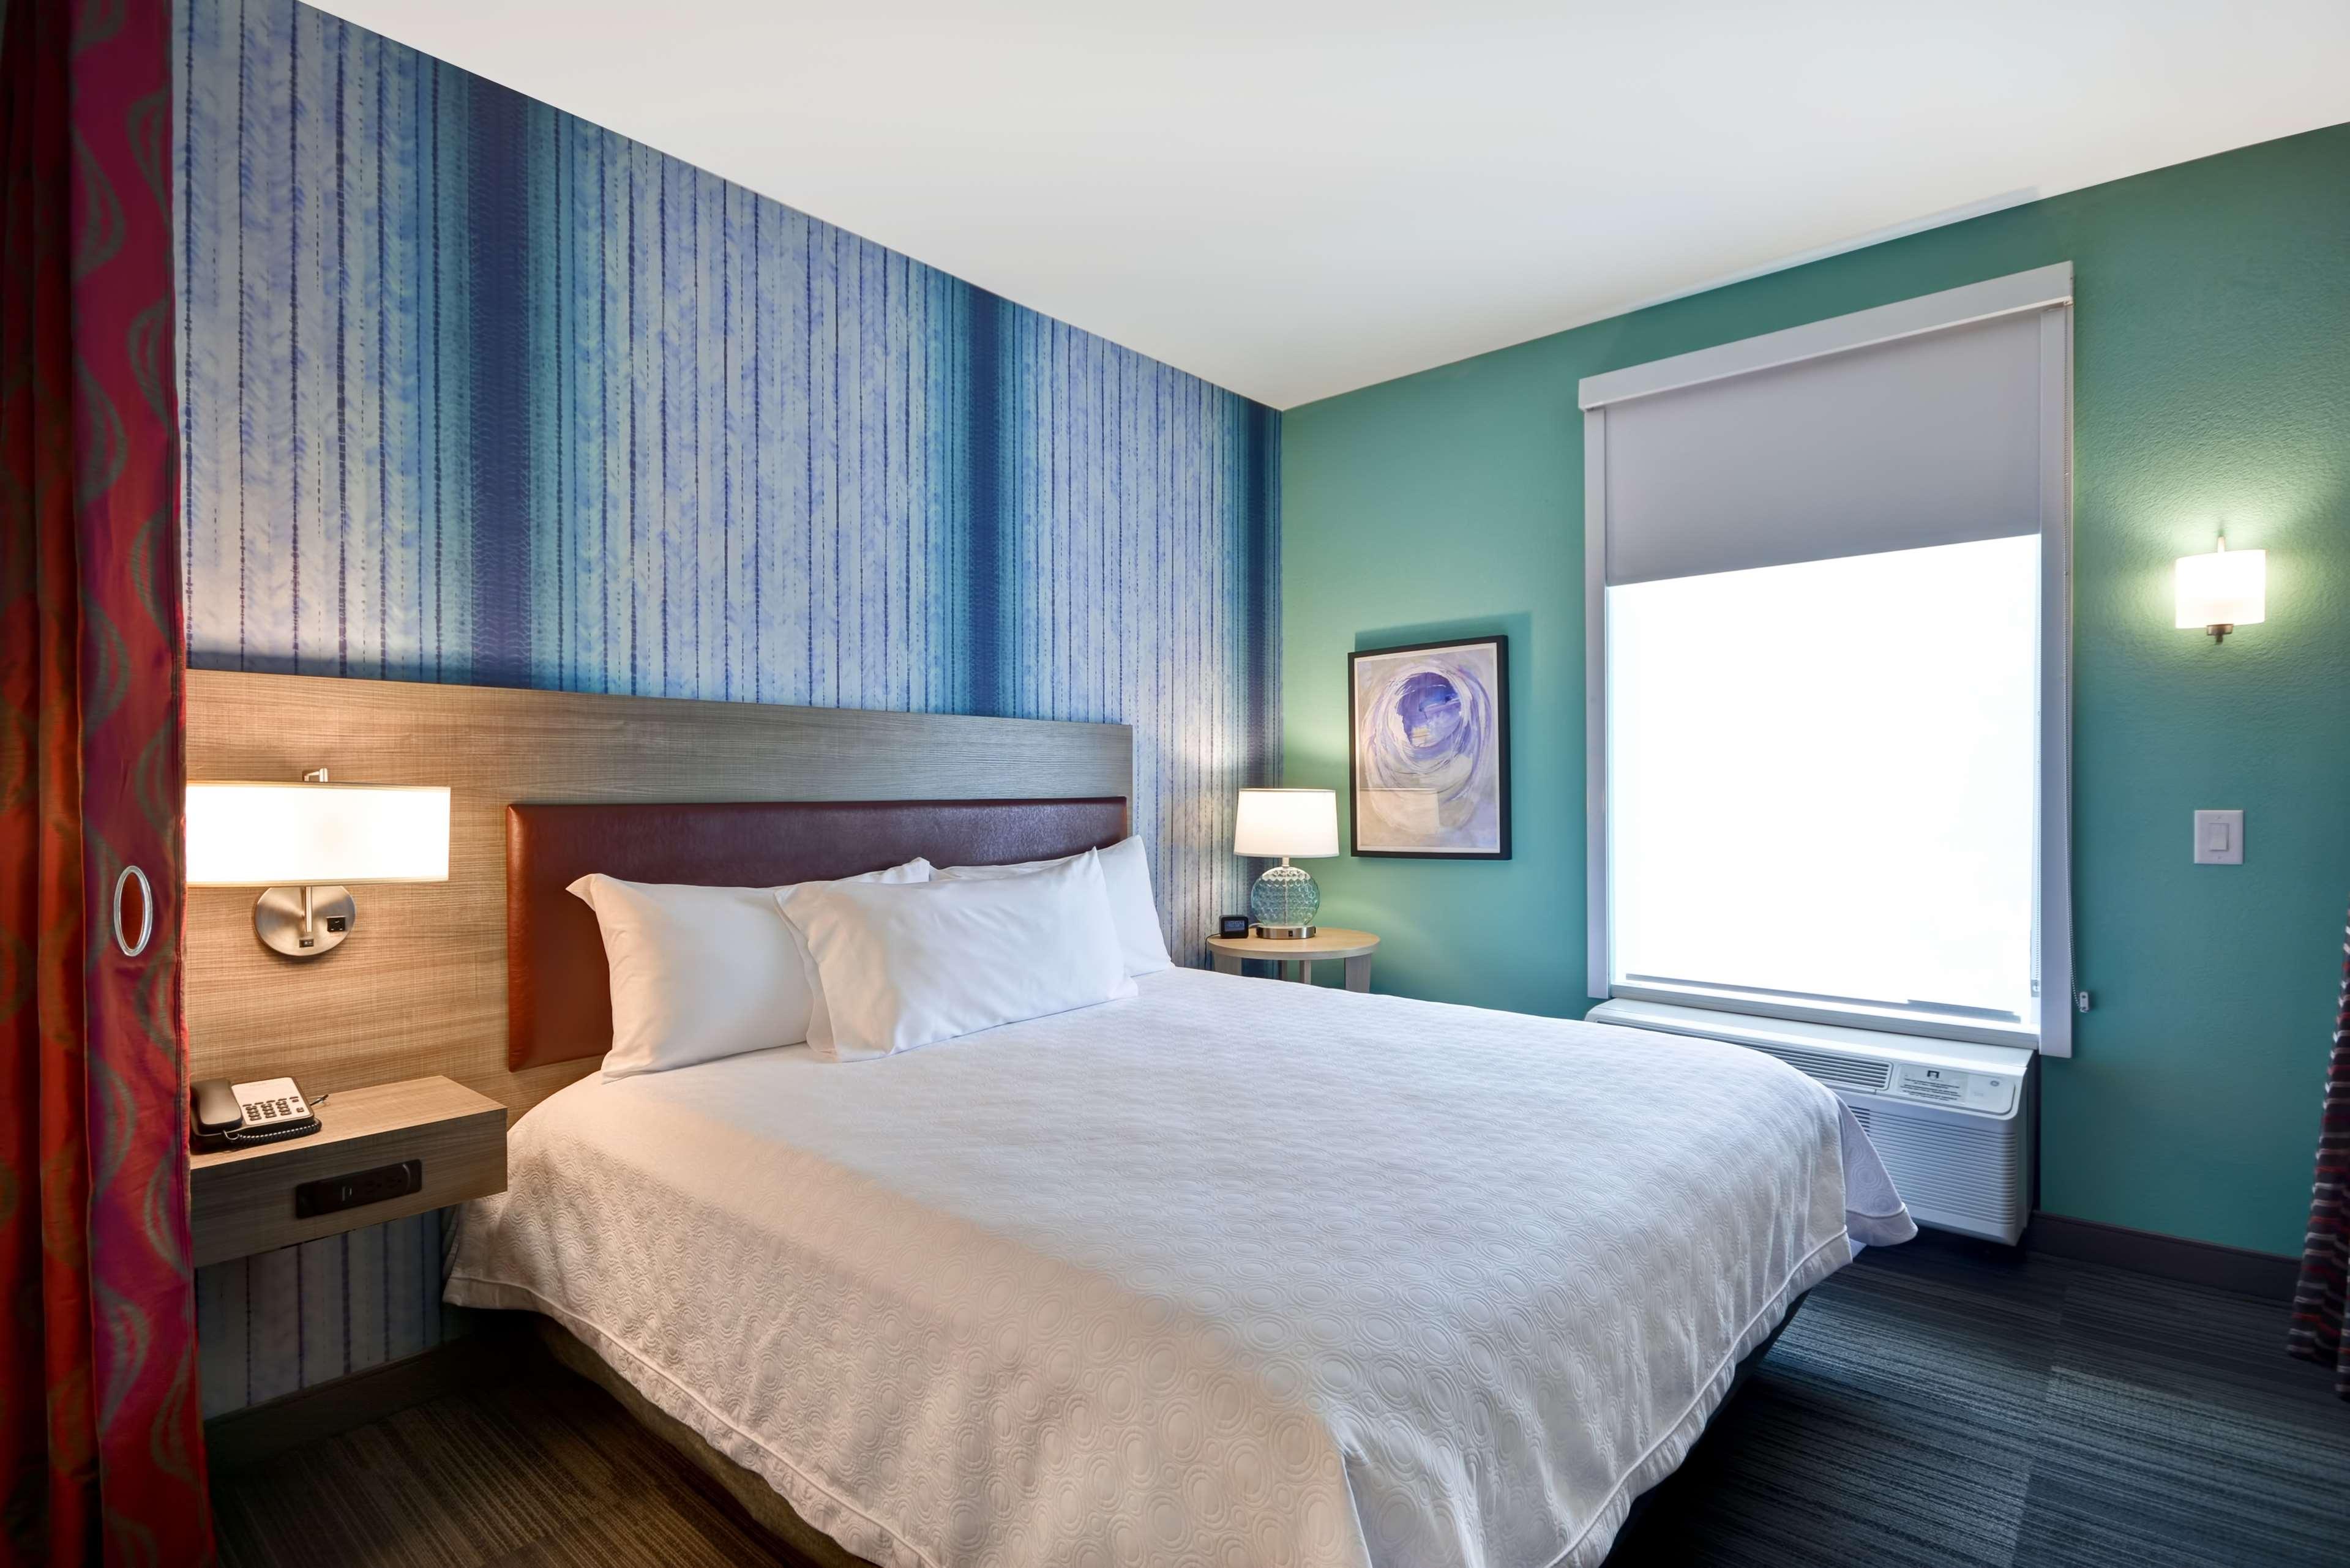 Home2 Suites by Hilton Atlanta West Lithia Springs image 26